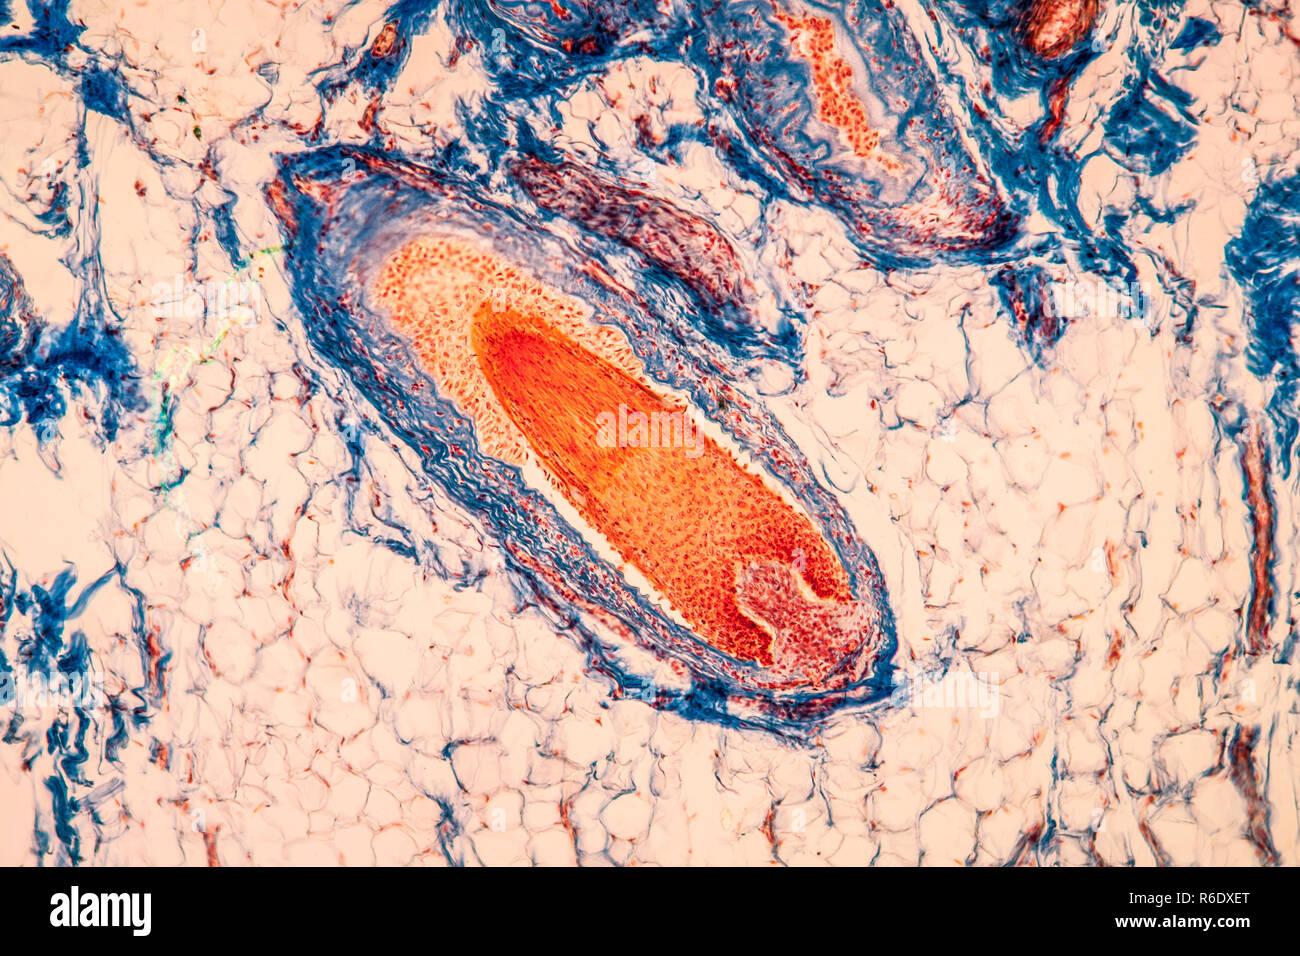 Deckblatt biologie mikroskop longitudinal cells stockfotos